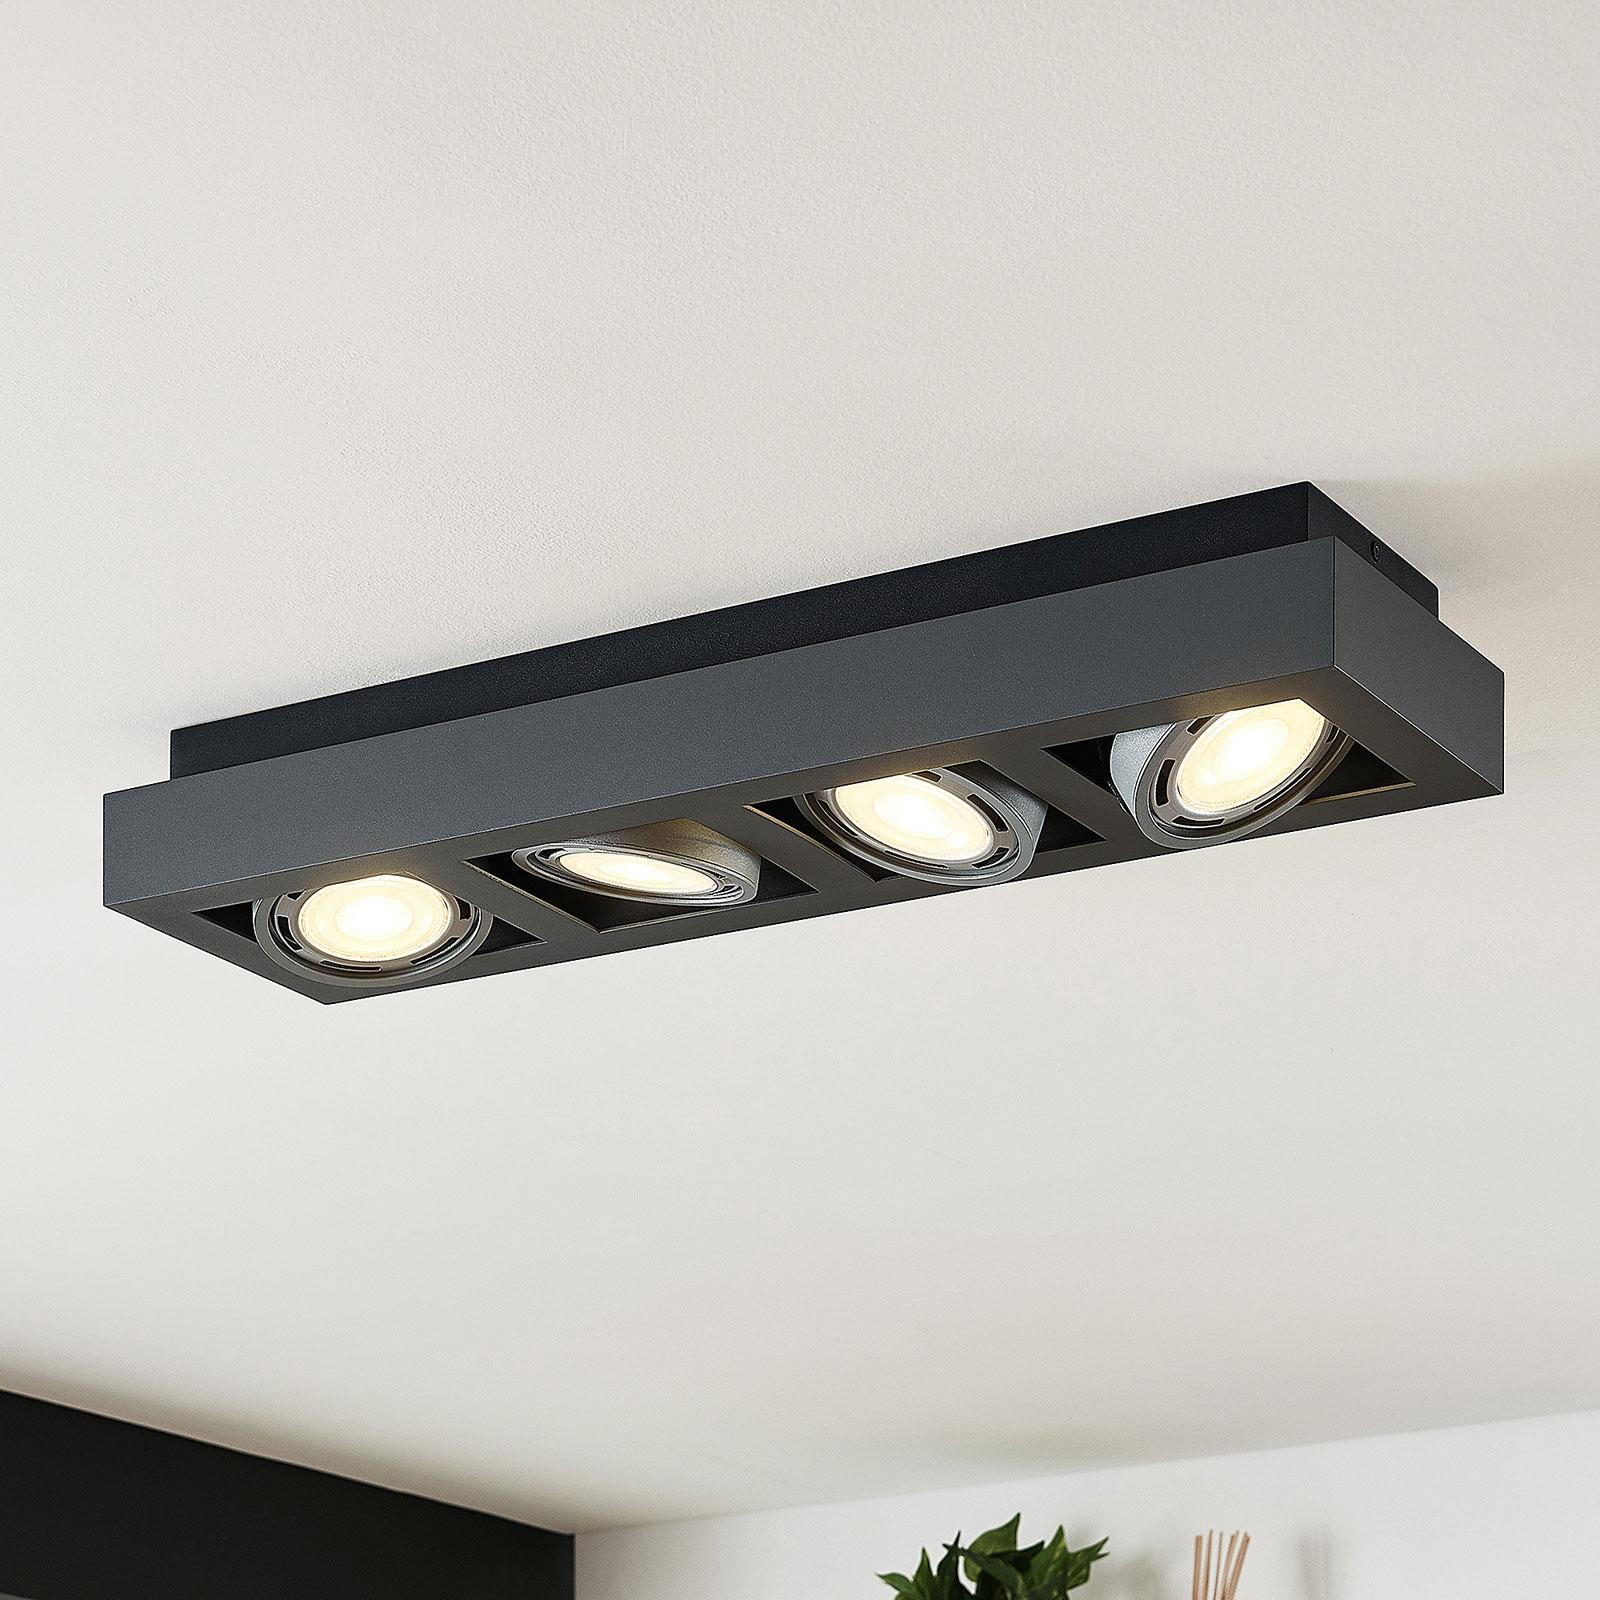 LED-Deckenstrahler Ronka, 4-fl., lang, grau